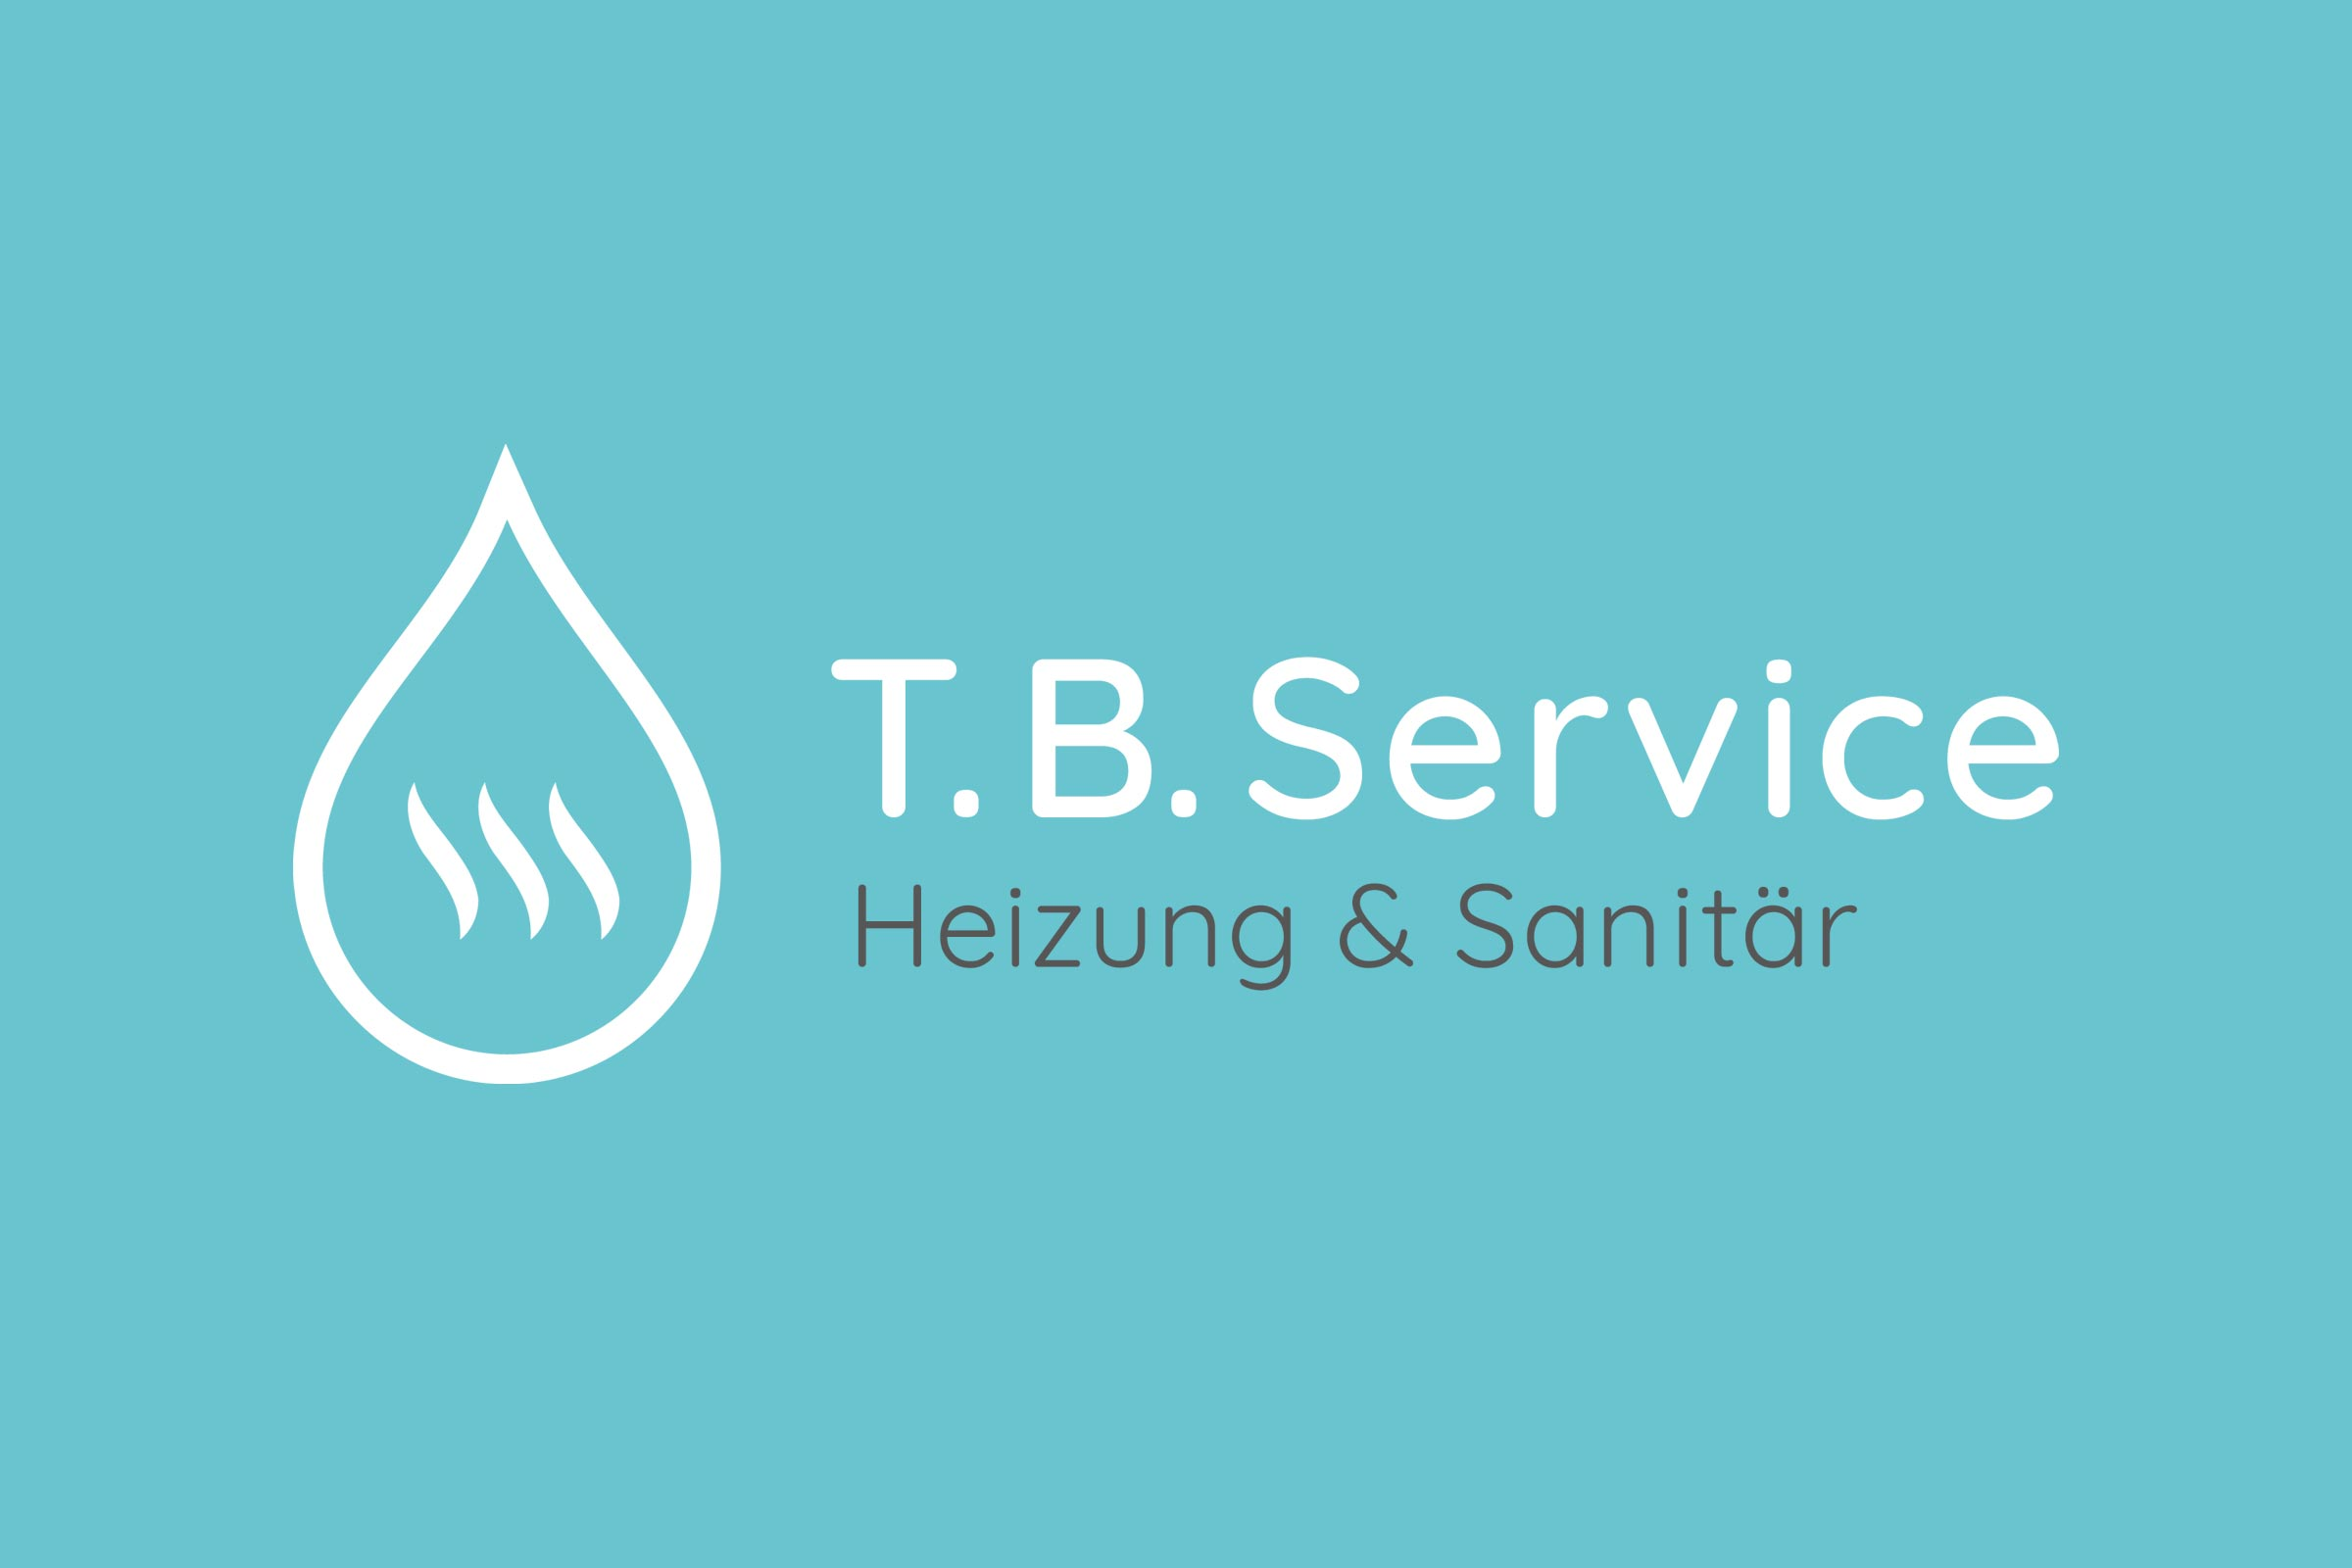 Logo T. B. Service